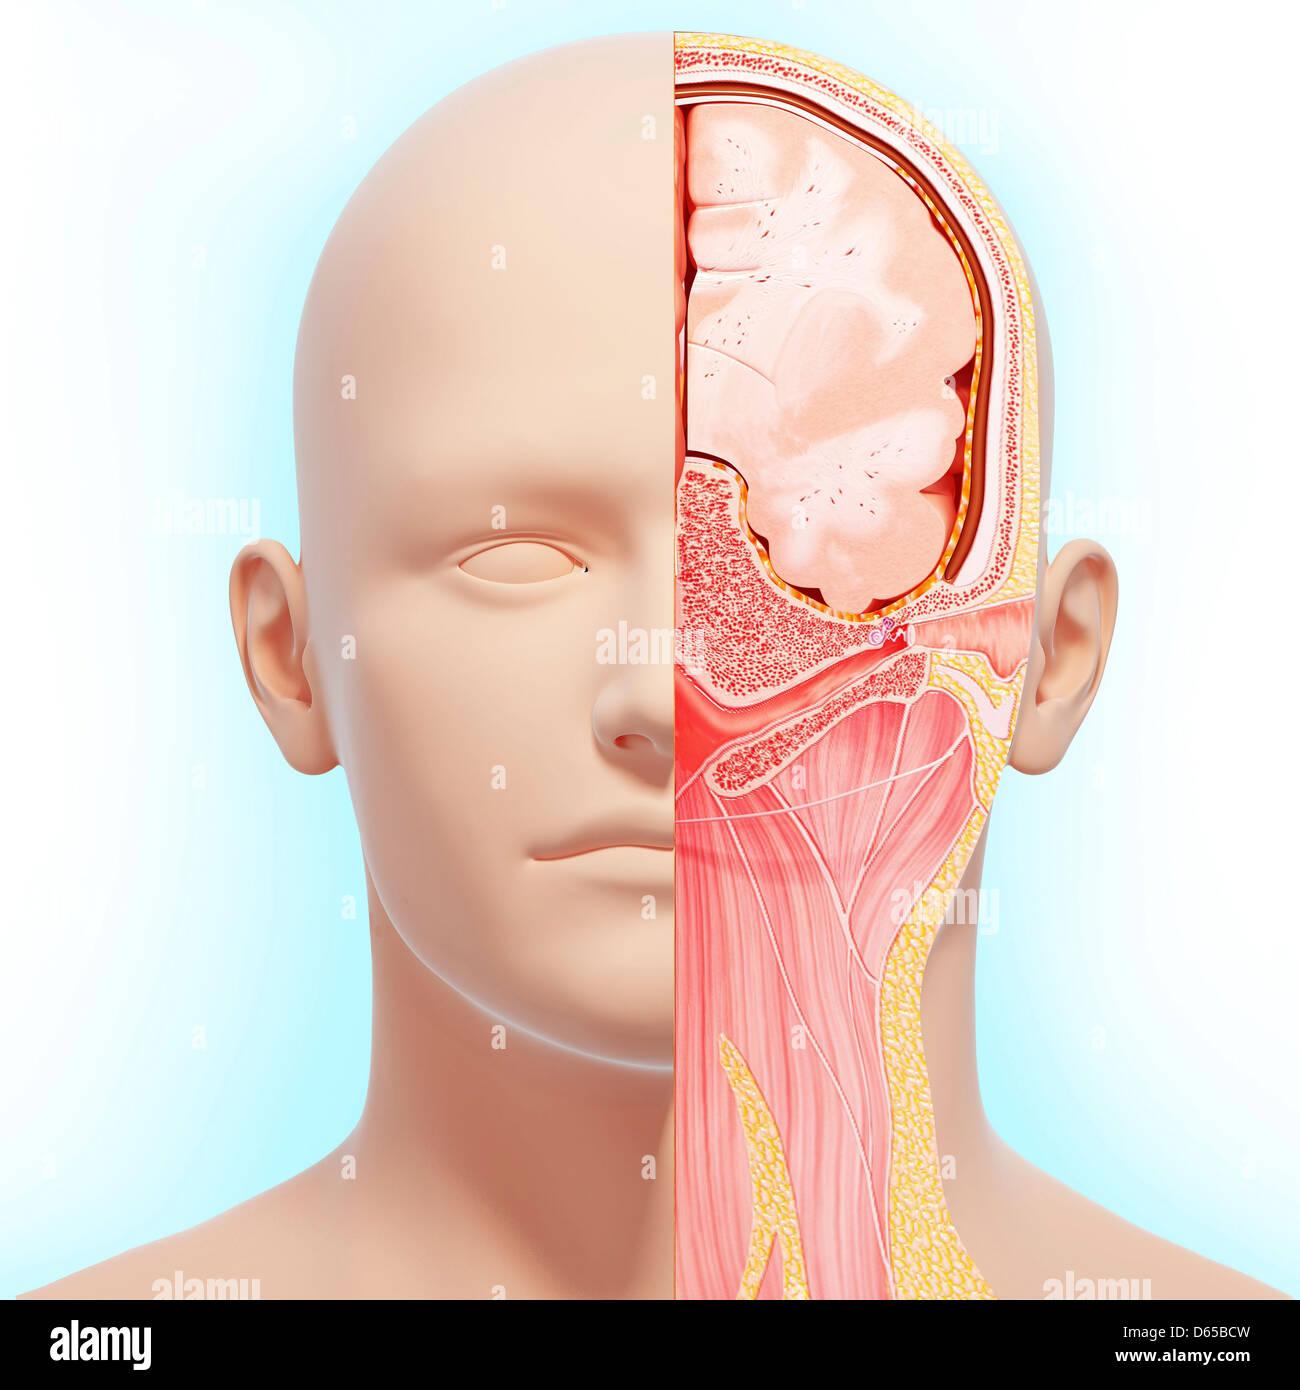 Kopf Anatomie, artwork Stockfoto, Bild: 55437785 - Alamy